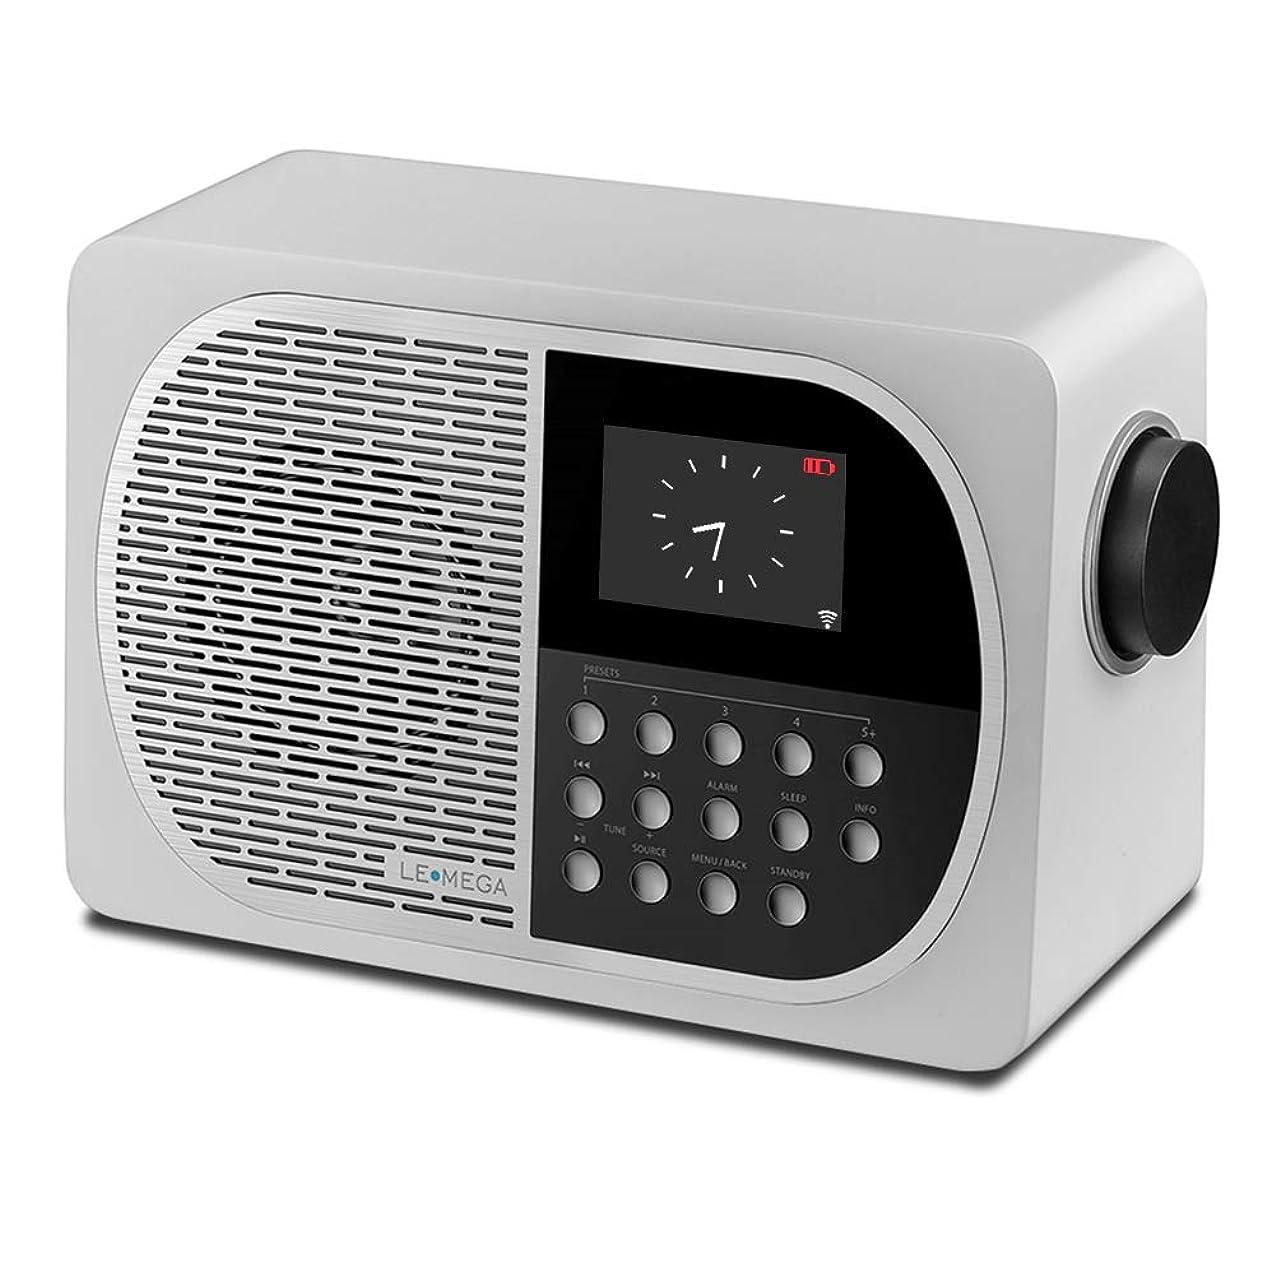 LEMEGA Portable Digital WiFi Wireless Internet Radio with Bluetooth Receiver & Ethernet Port,Spotify Connect, FM HD Radio,Smart Speakers, 2.8